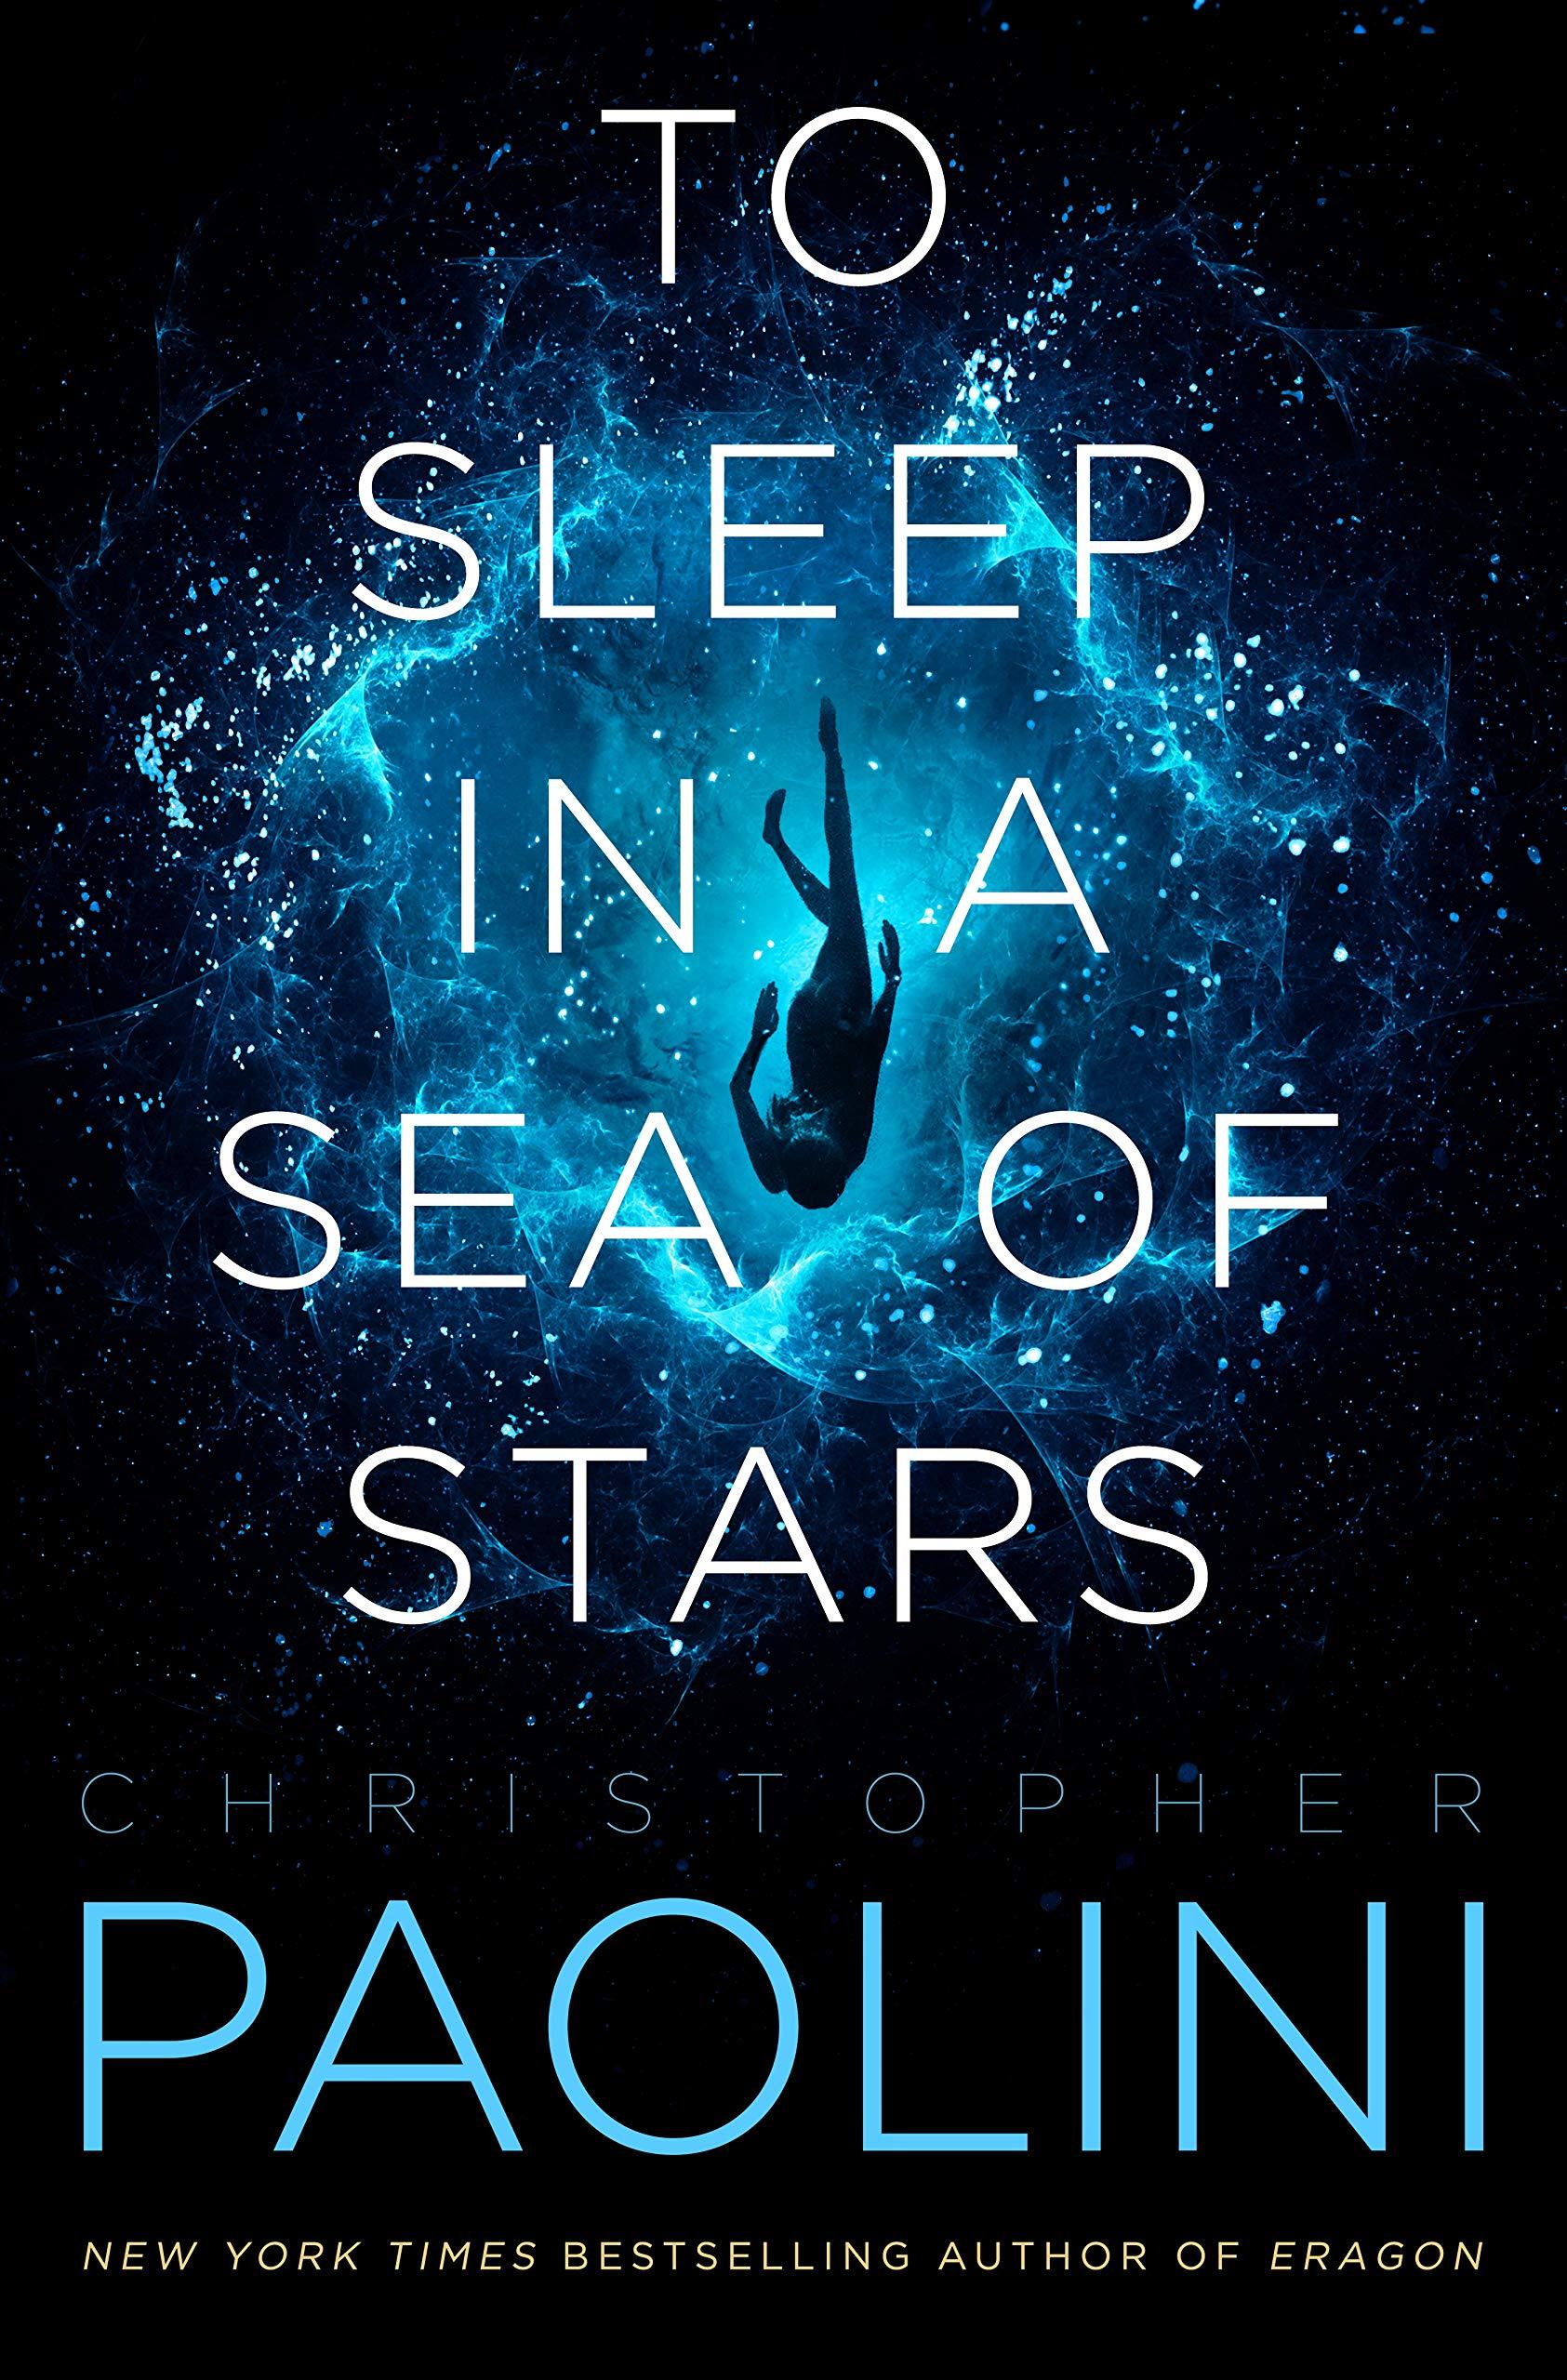 Amazon.com: To Sleep in a Sea of Stars (9781250762849): Paolini,  Christopher: Books